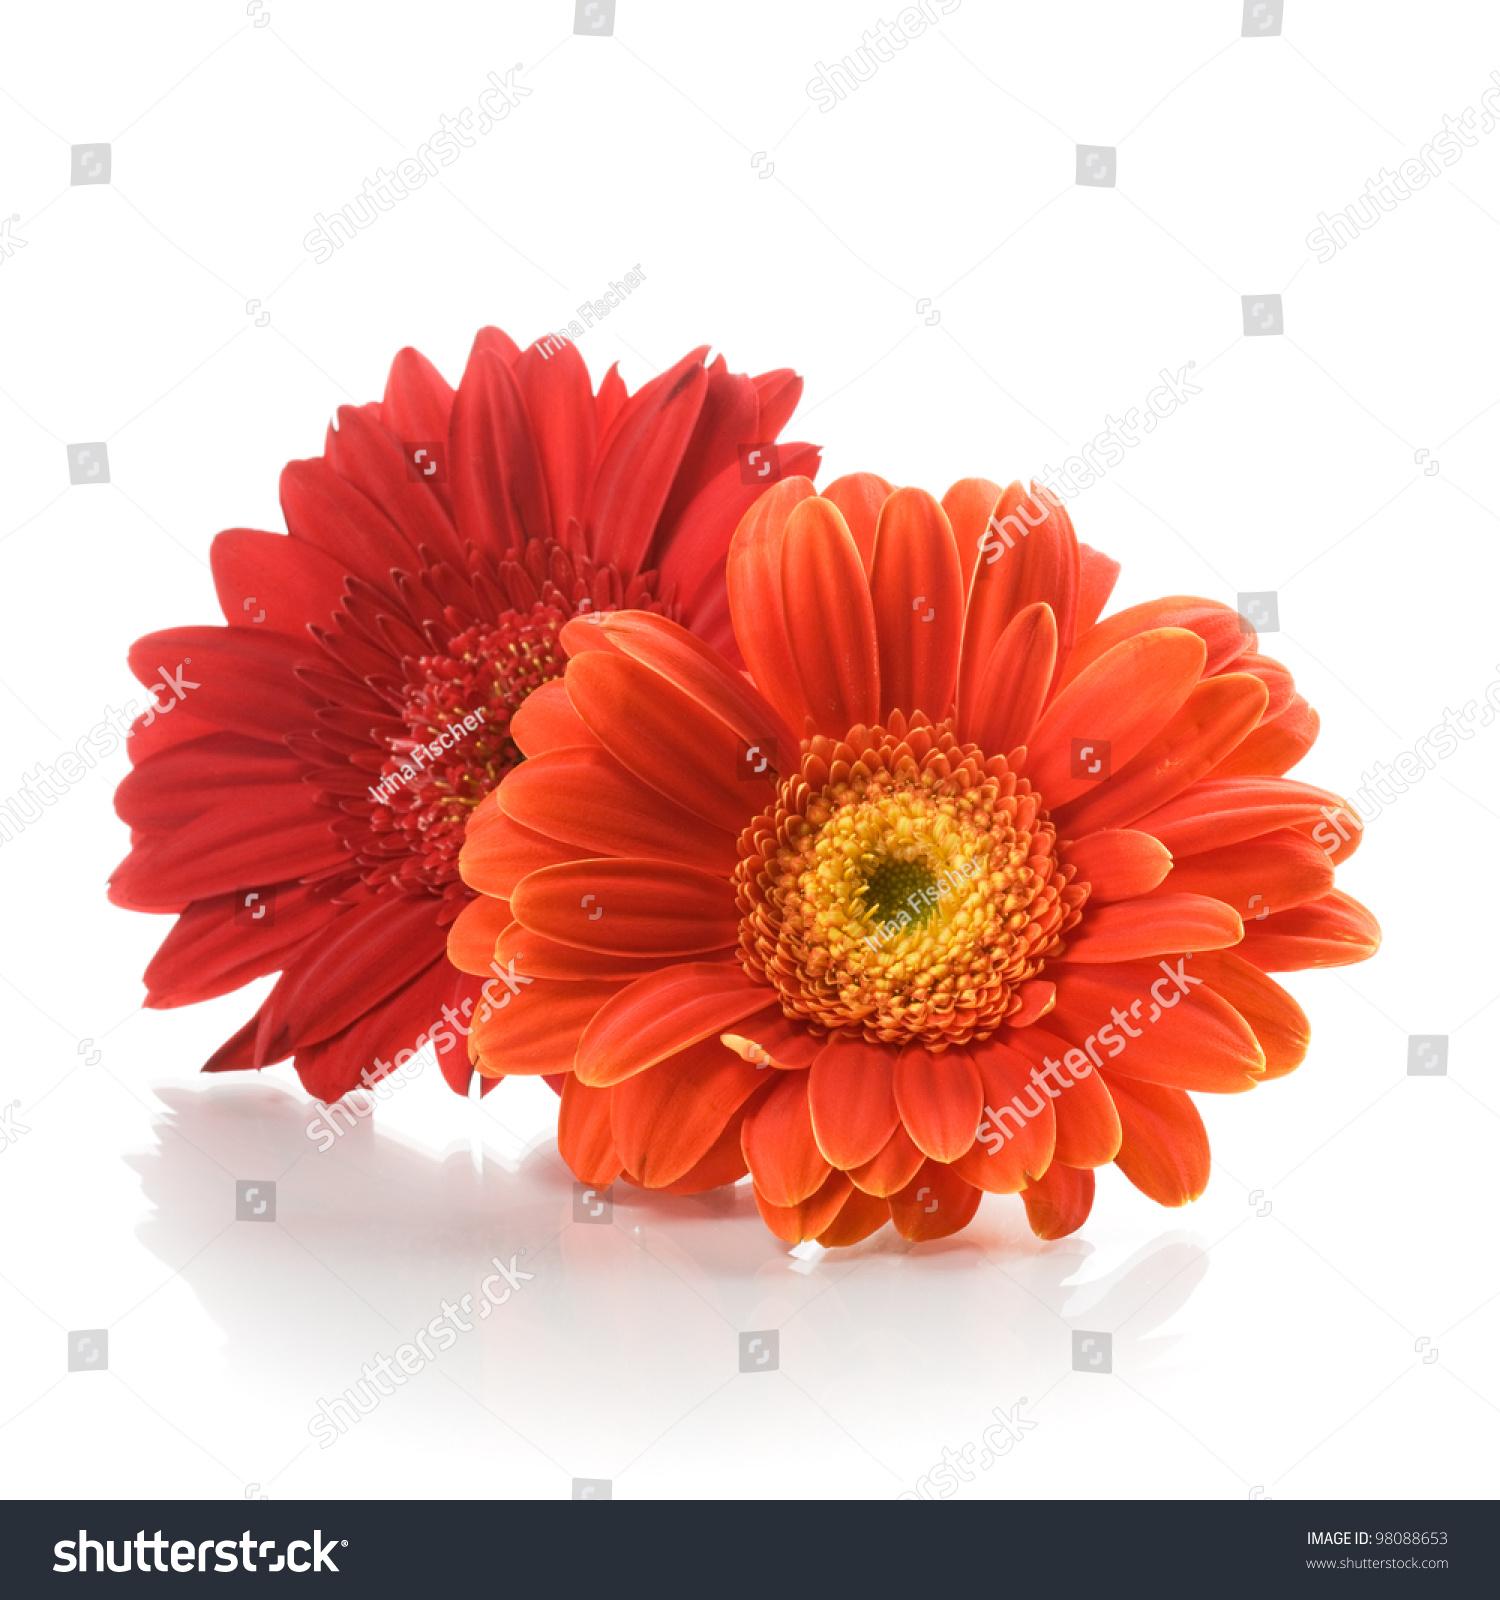 Two red gerbera daisy flowers on white background ez canvas id 98088653 izmirmasajfo